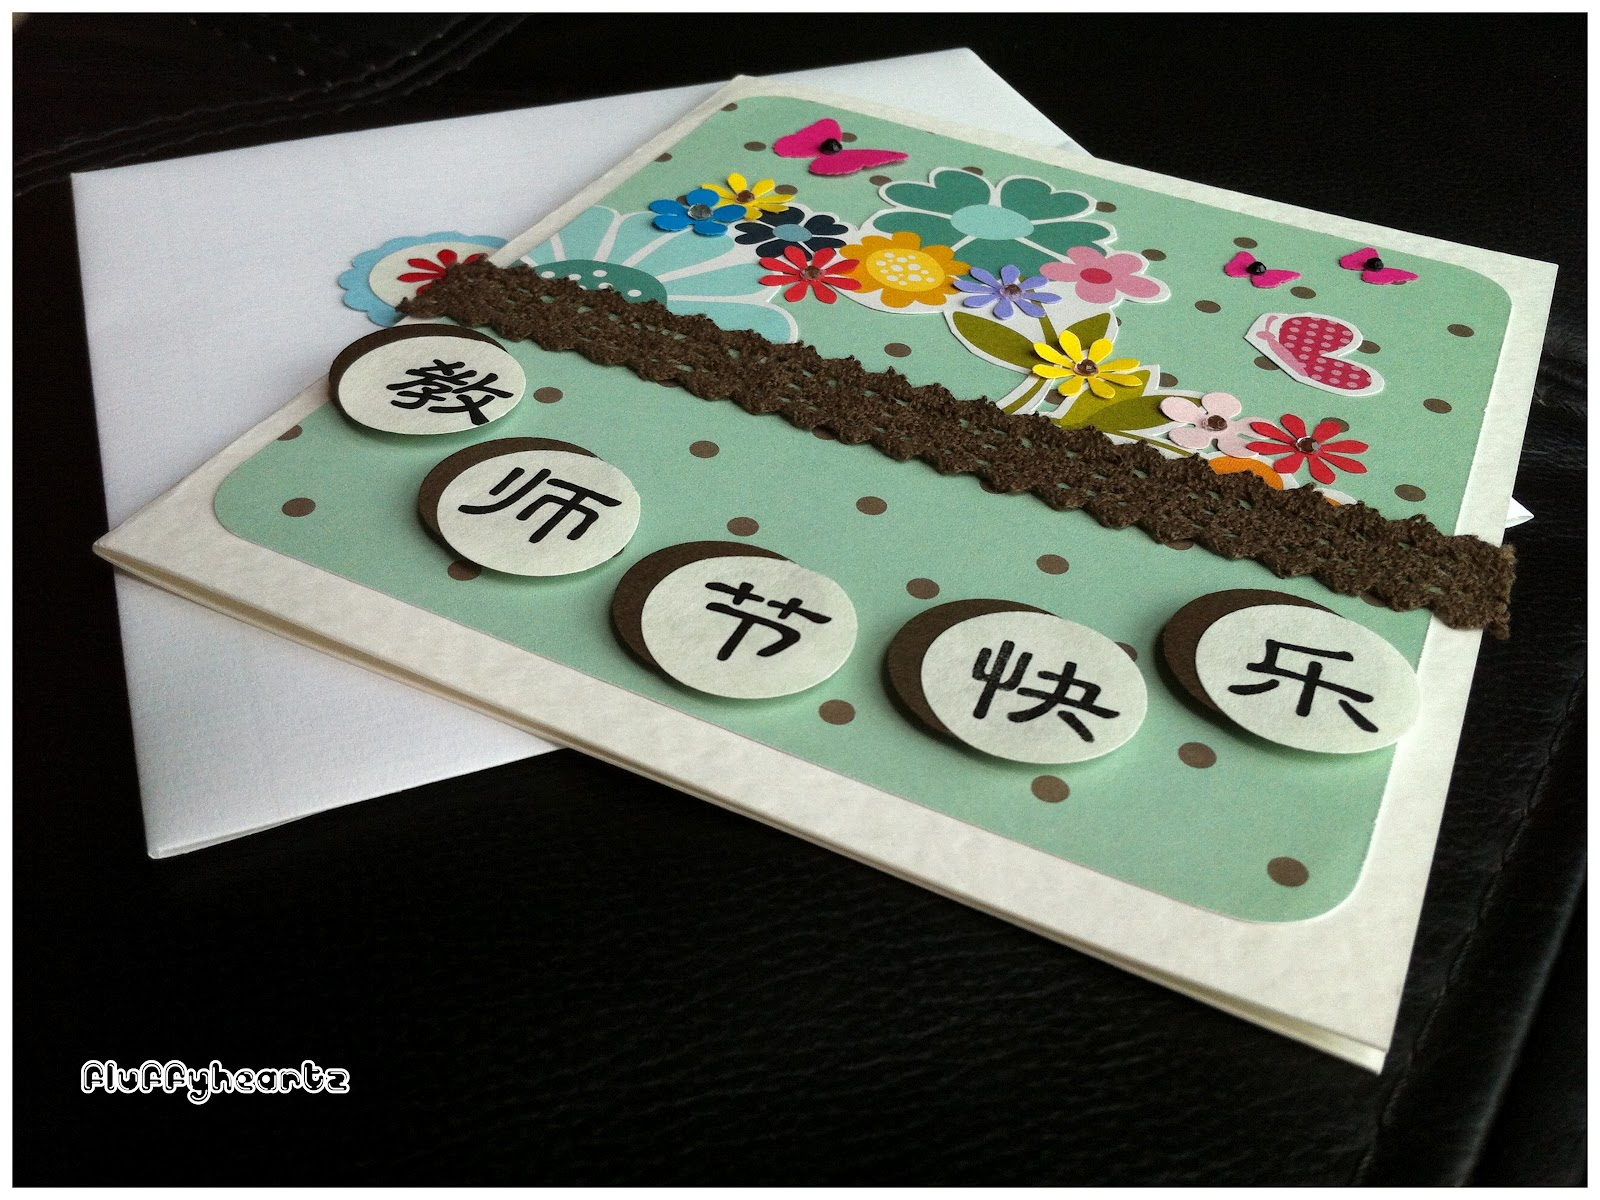 fluffyheartz ♥ teacher's day cards for chinese teachers